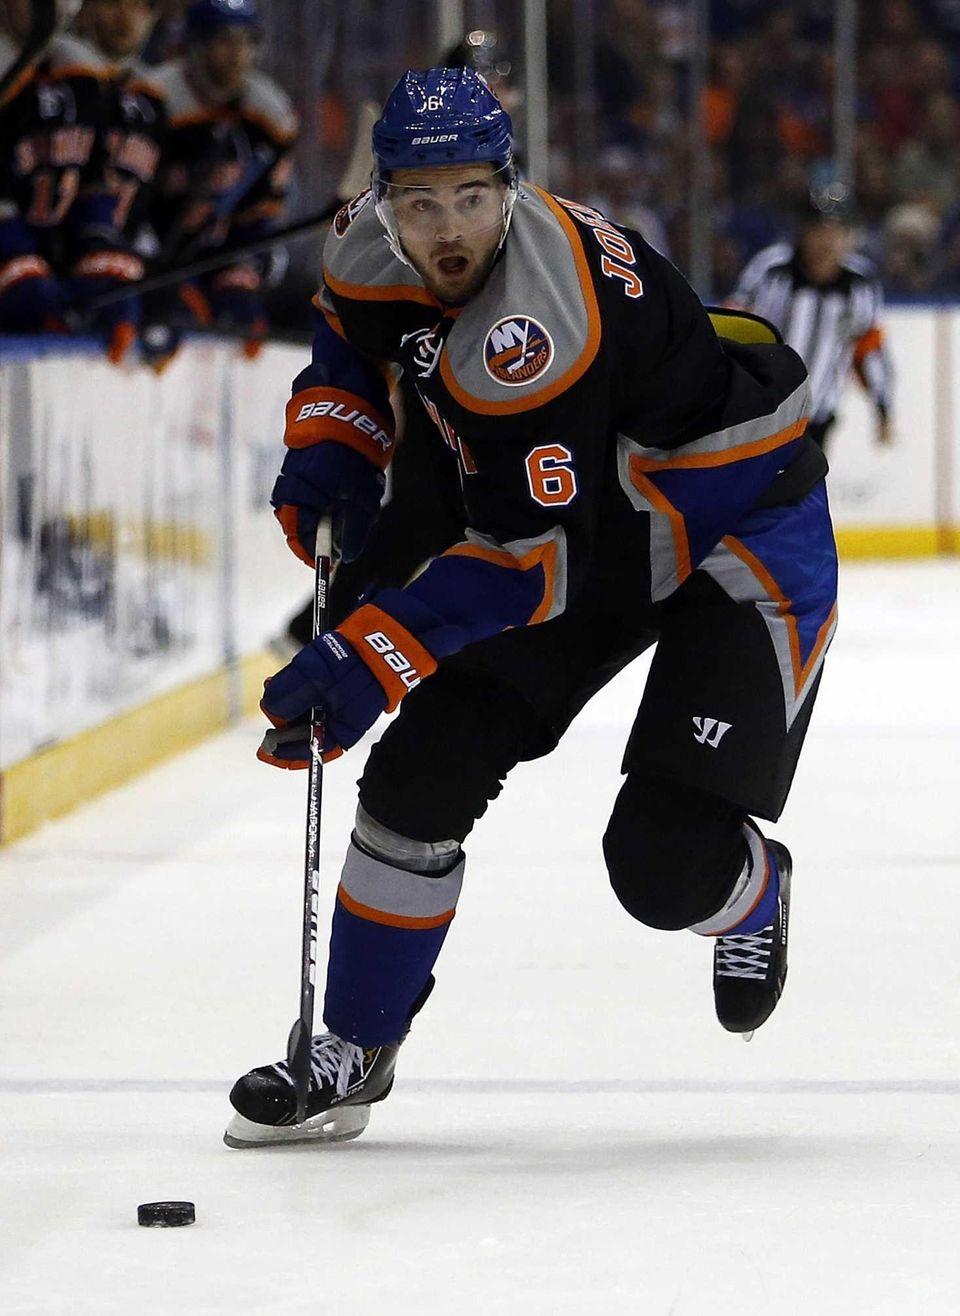 Islanders left wing Jesse Joensuu controls the puck